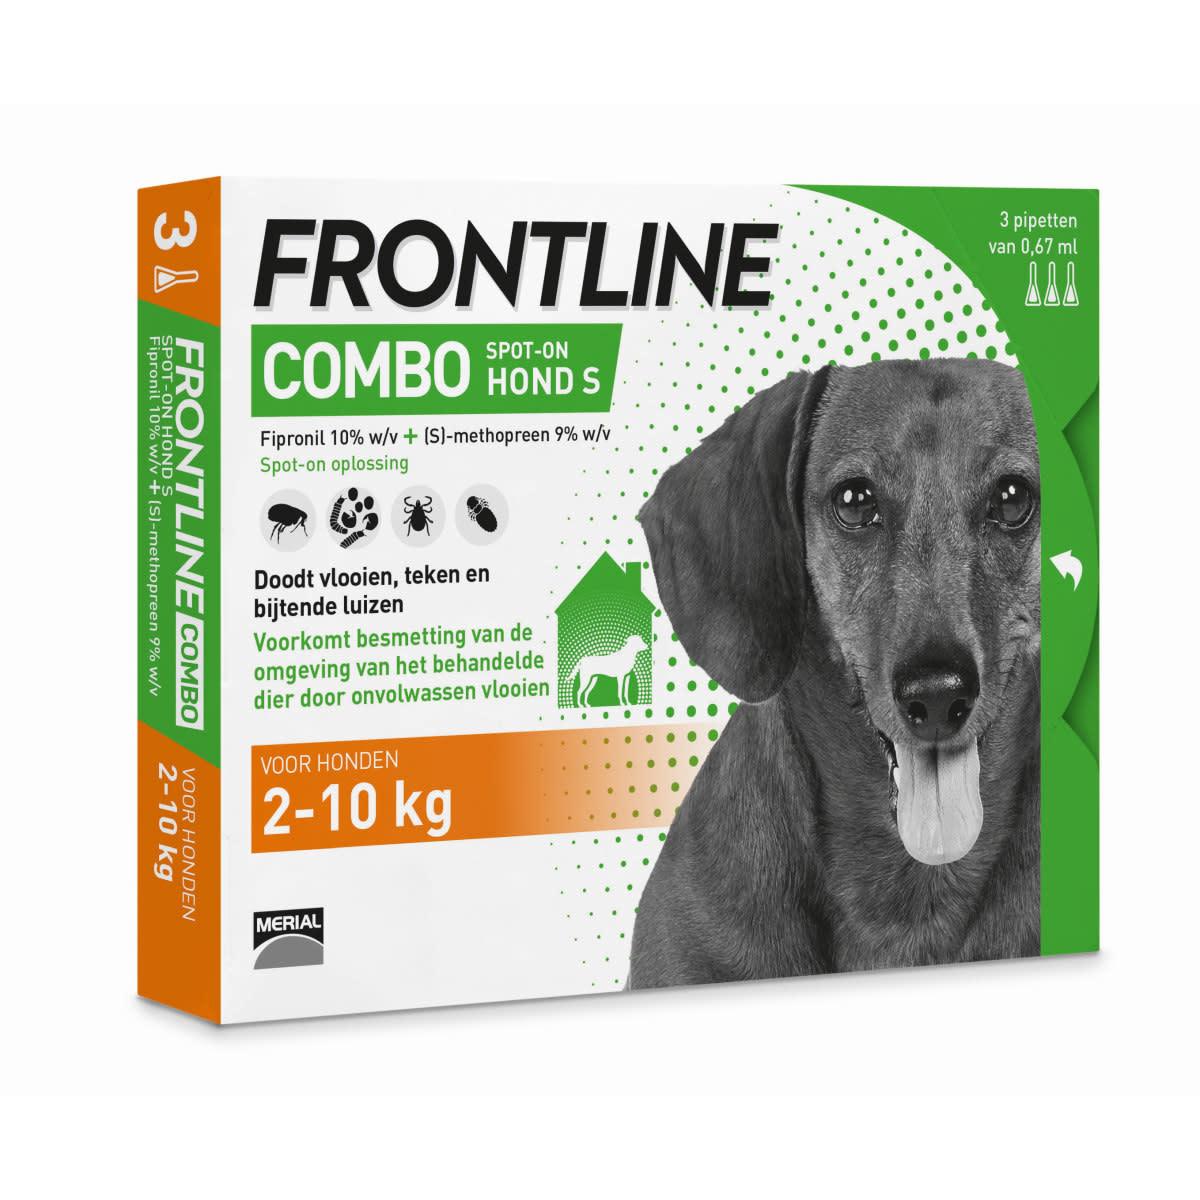 Frontline FRONTLINE - COMBO 3 PIPETTEN S